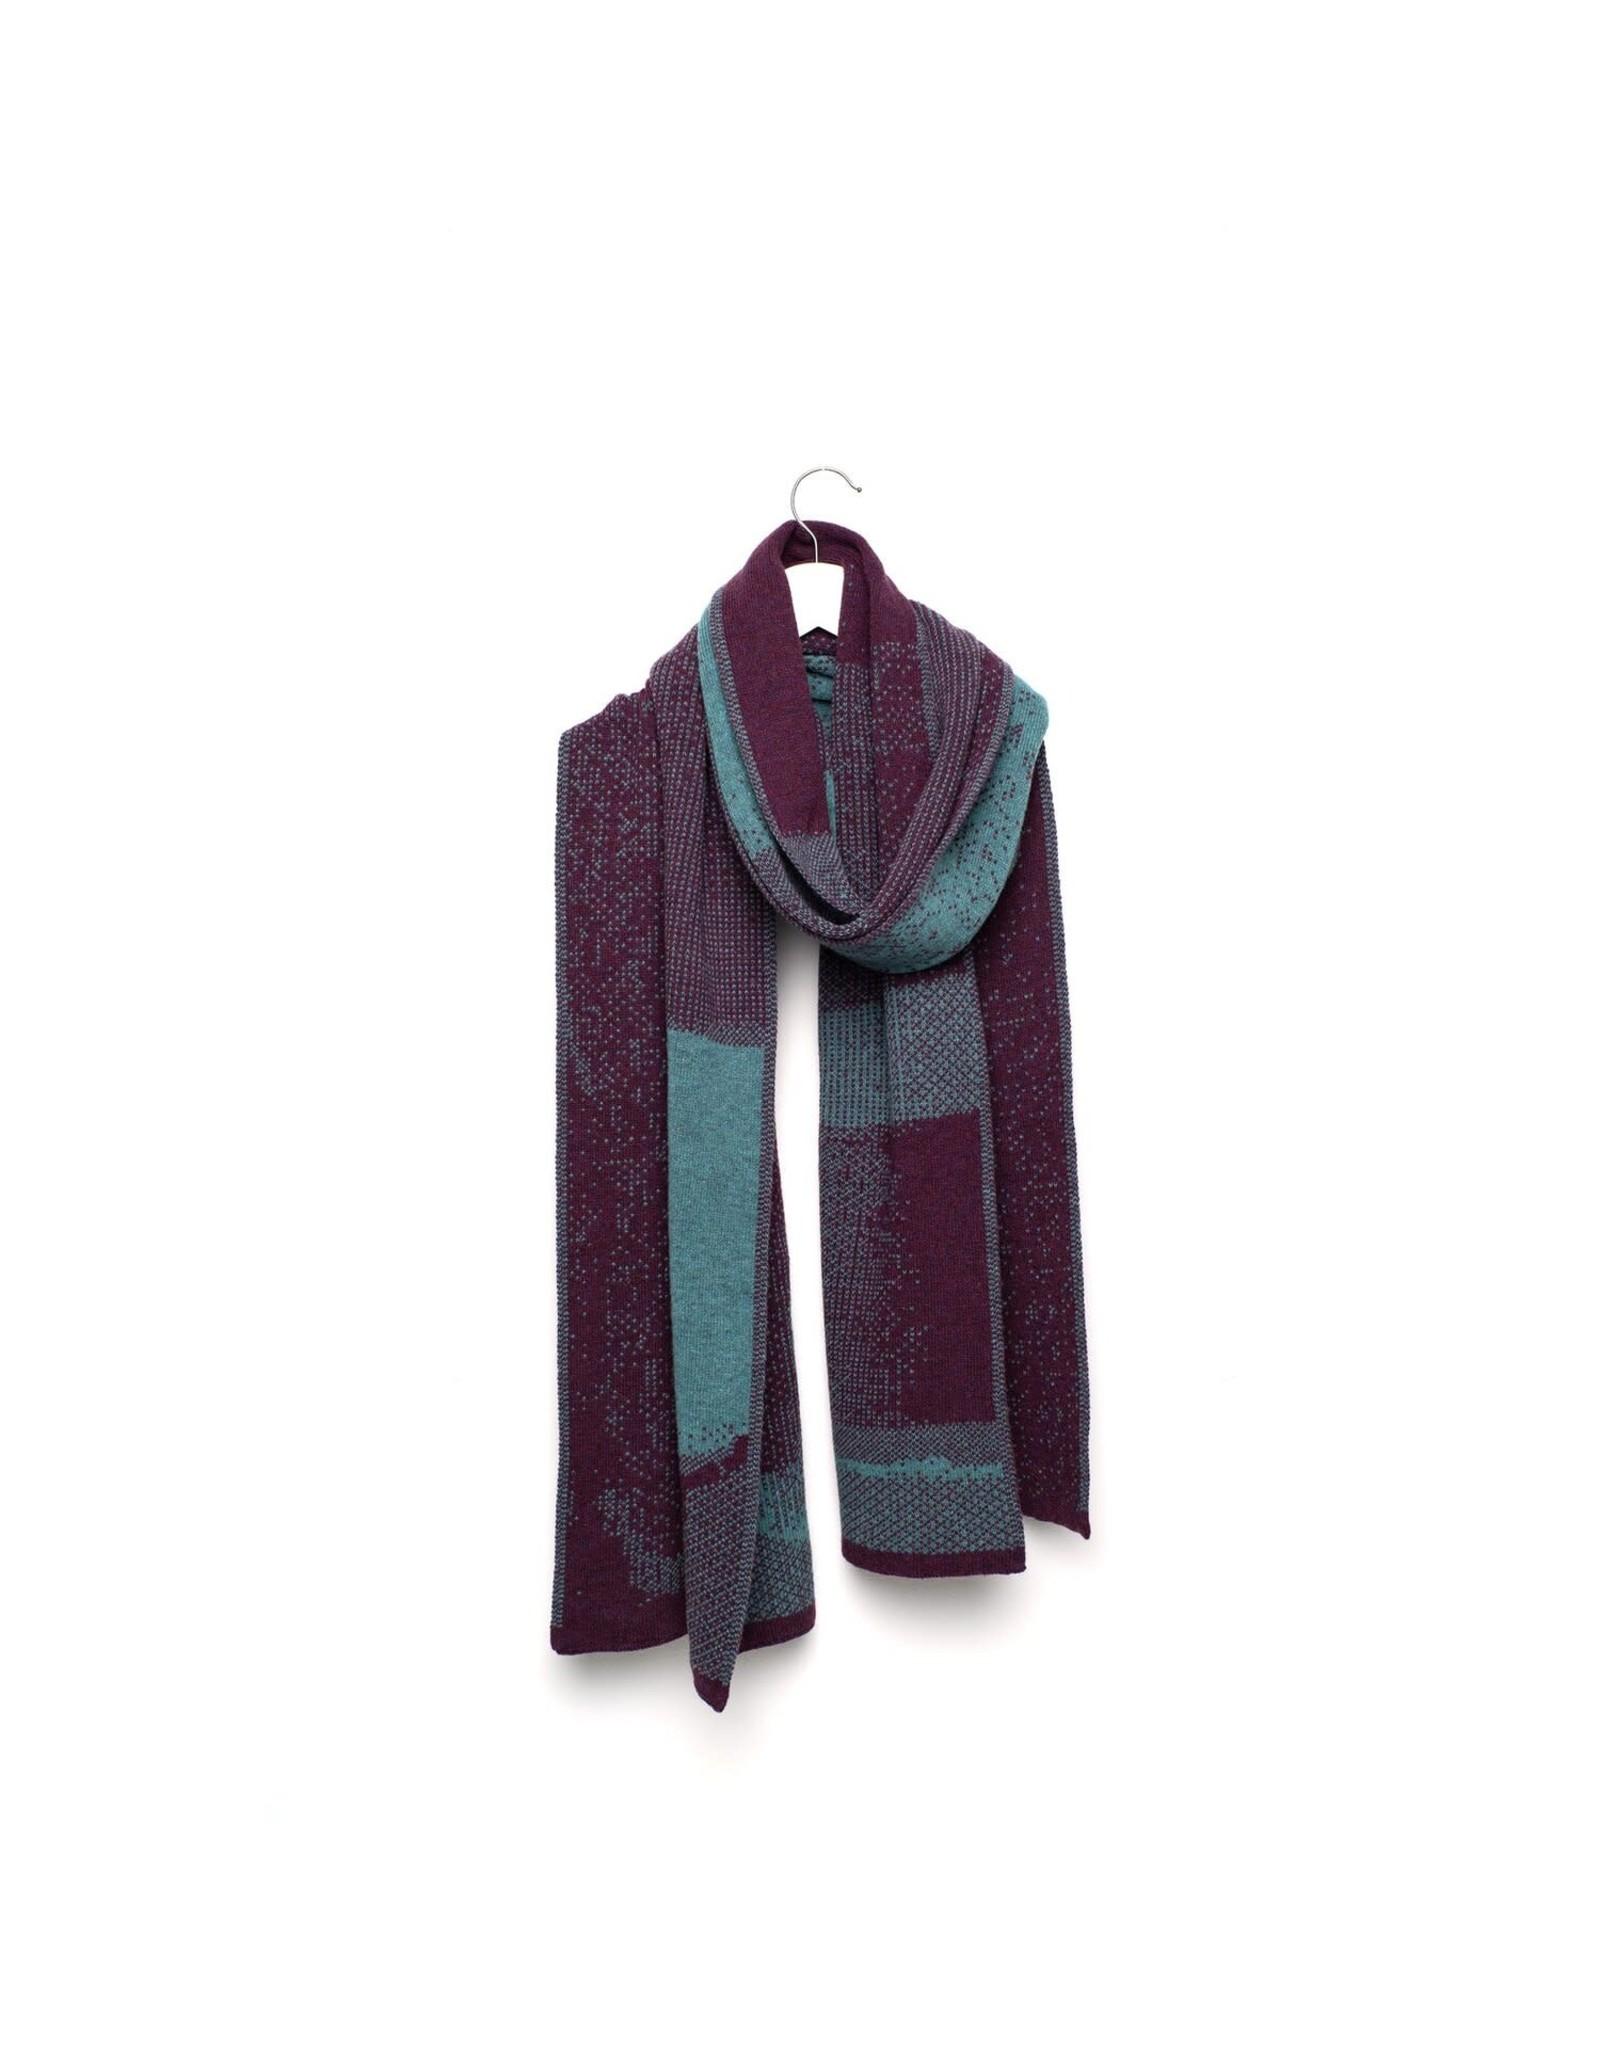 Wolvis Wolvis - 4th of September 1990 - Olive Green and Aubergine - 220cm x 40 - 100% Merino Wool - 100% made in Belgium